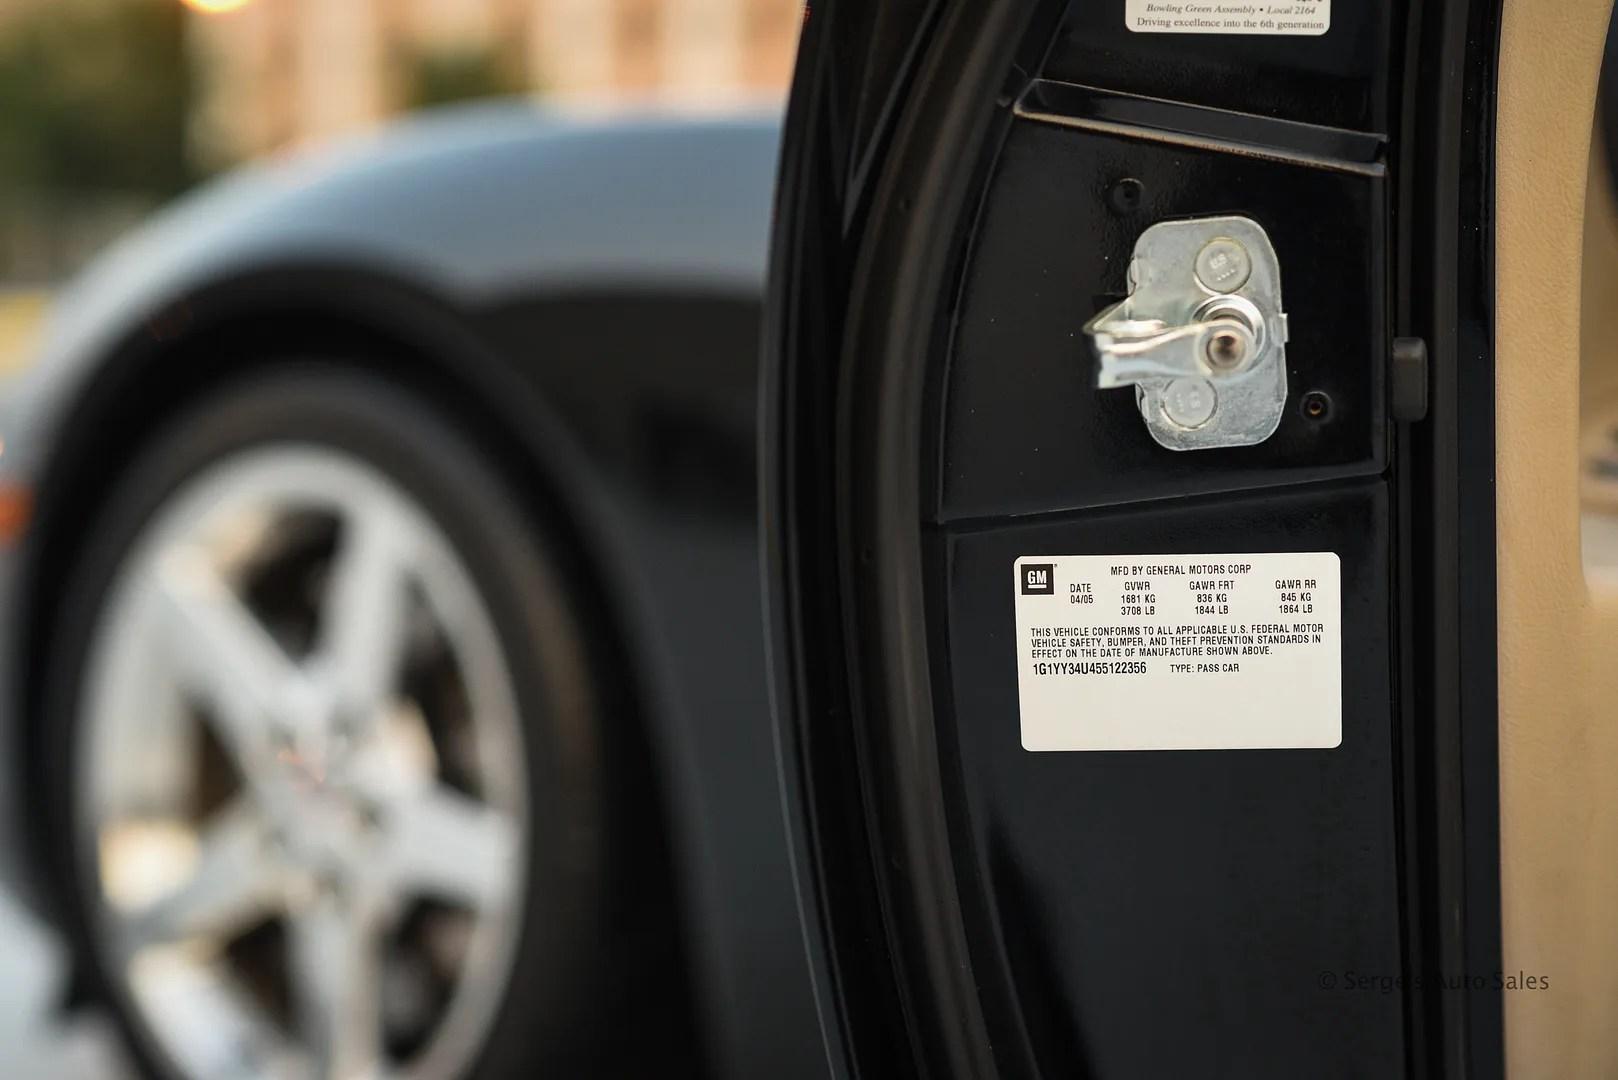 photo 2005-C6-Corvette-Convertible-For-Sale-Scranton-Serges-Auto-Sales-dealer--76_zpspo8fkcpg.jpg